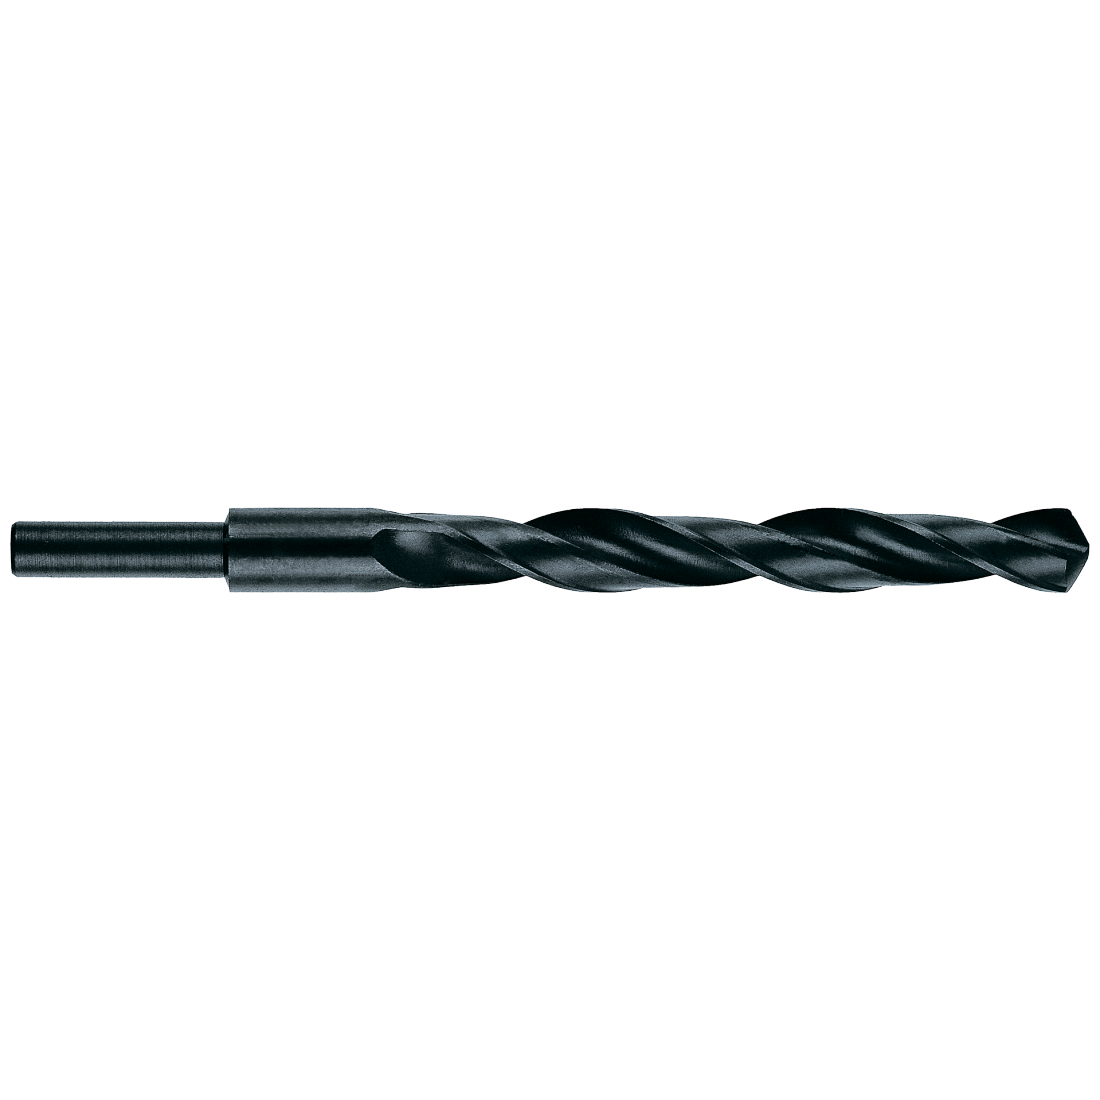 Сверло по металлу Heller HSS cо ступенчатым хвостовиком 16,5х125х184мм